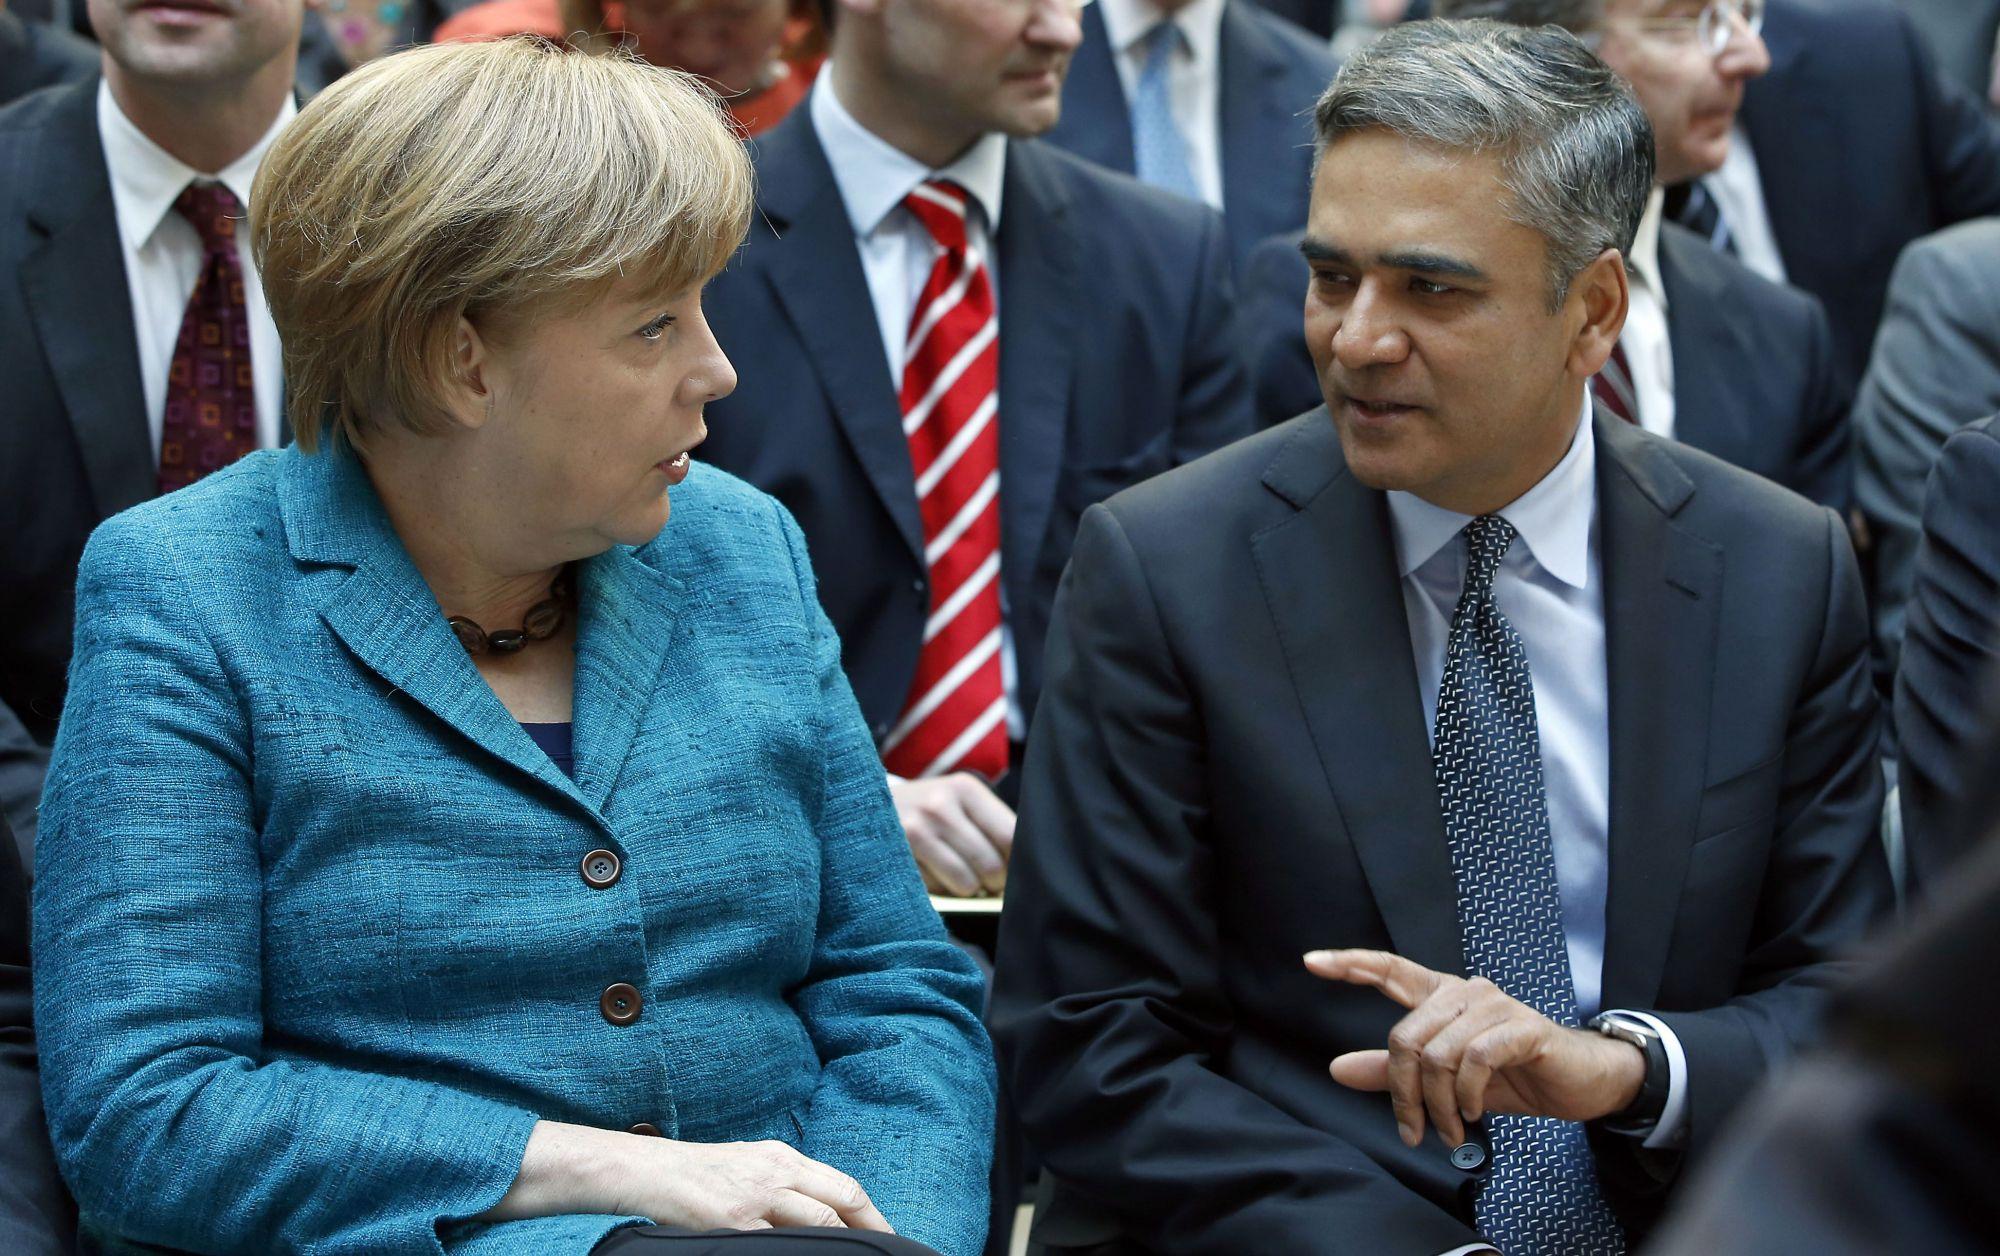 Anshu-Jain-Deutsche-Bank-Merkel-Germany